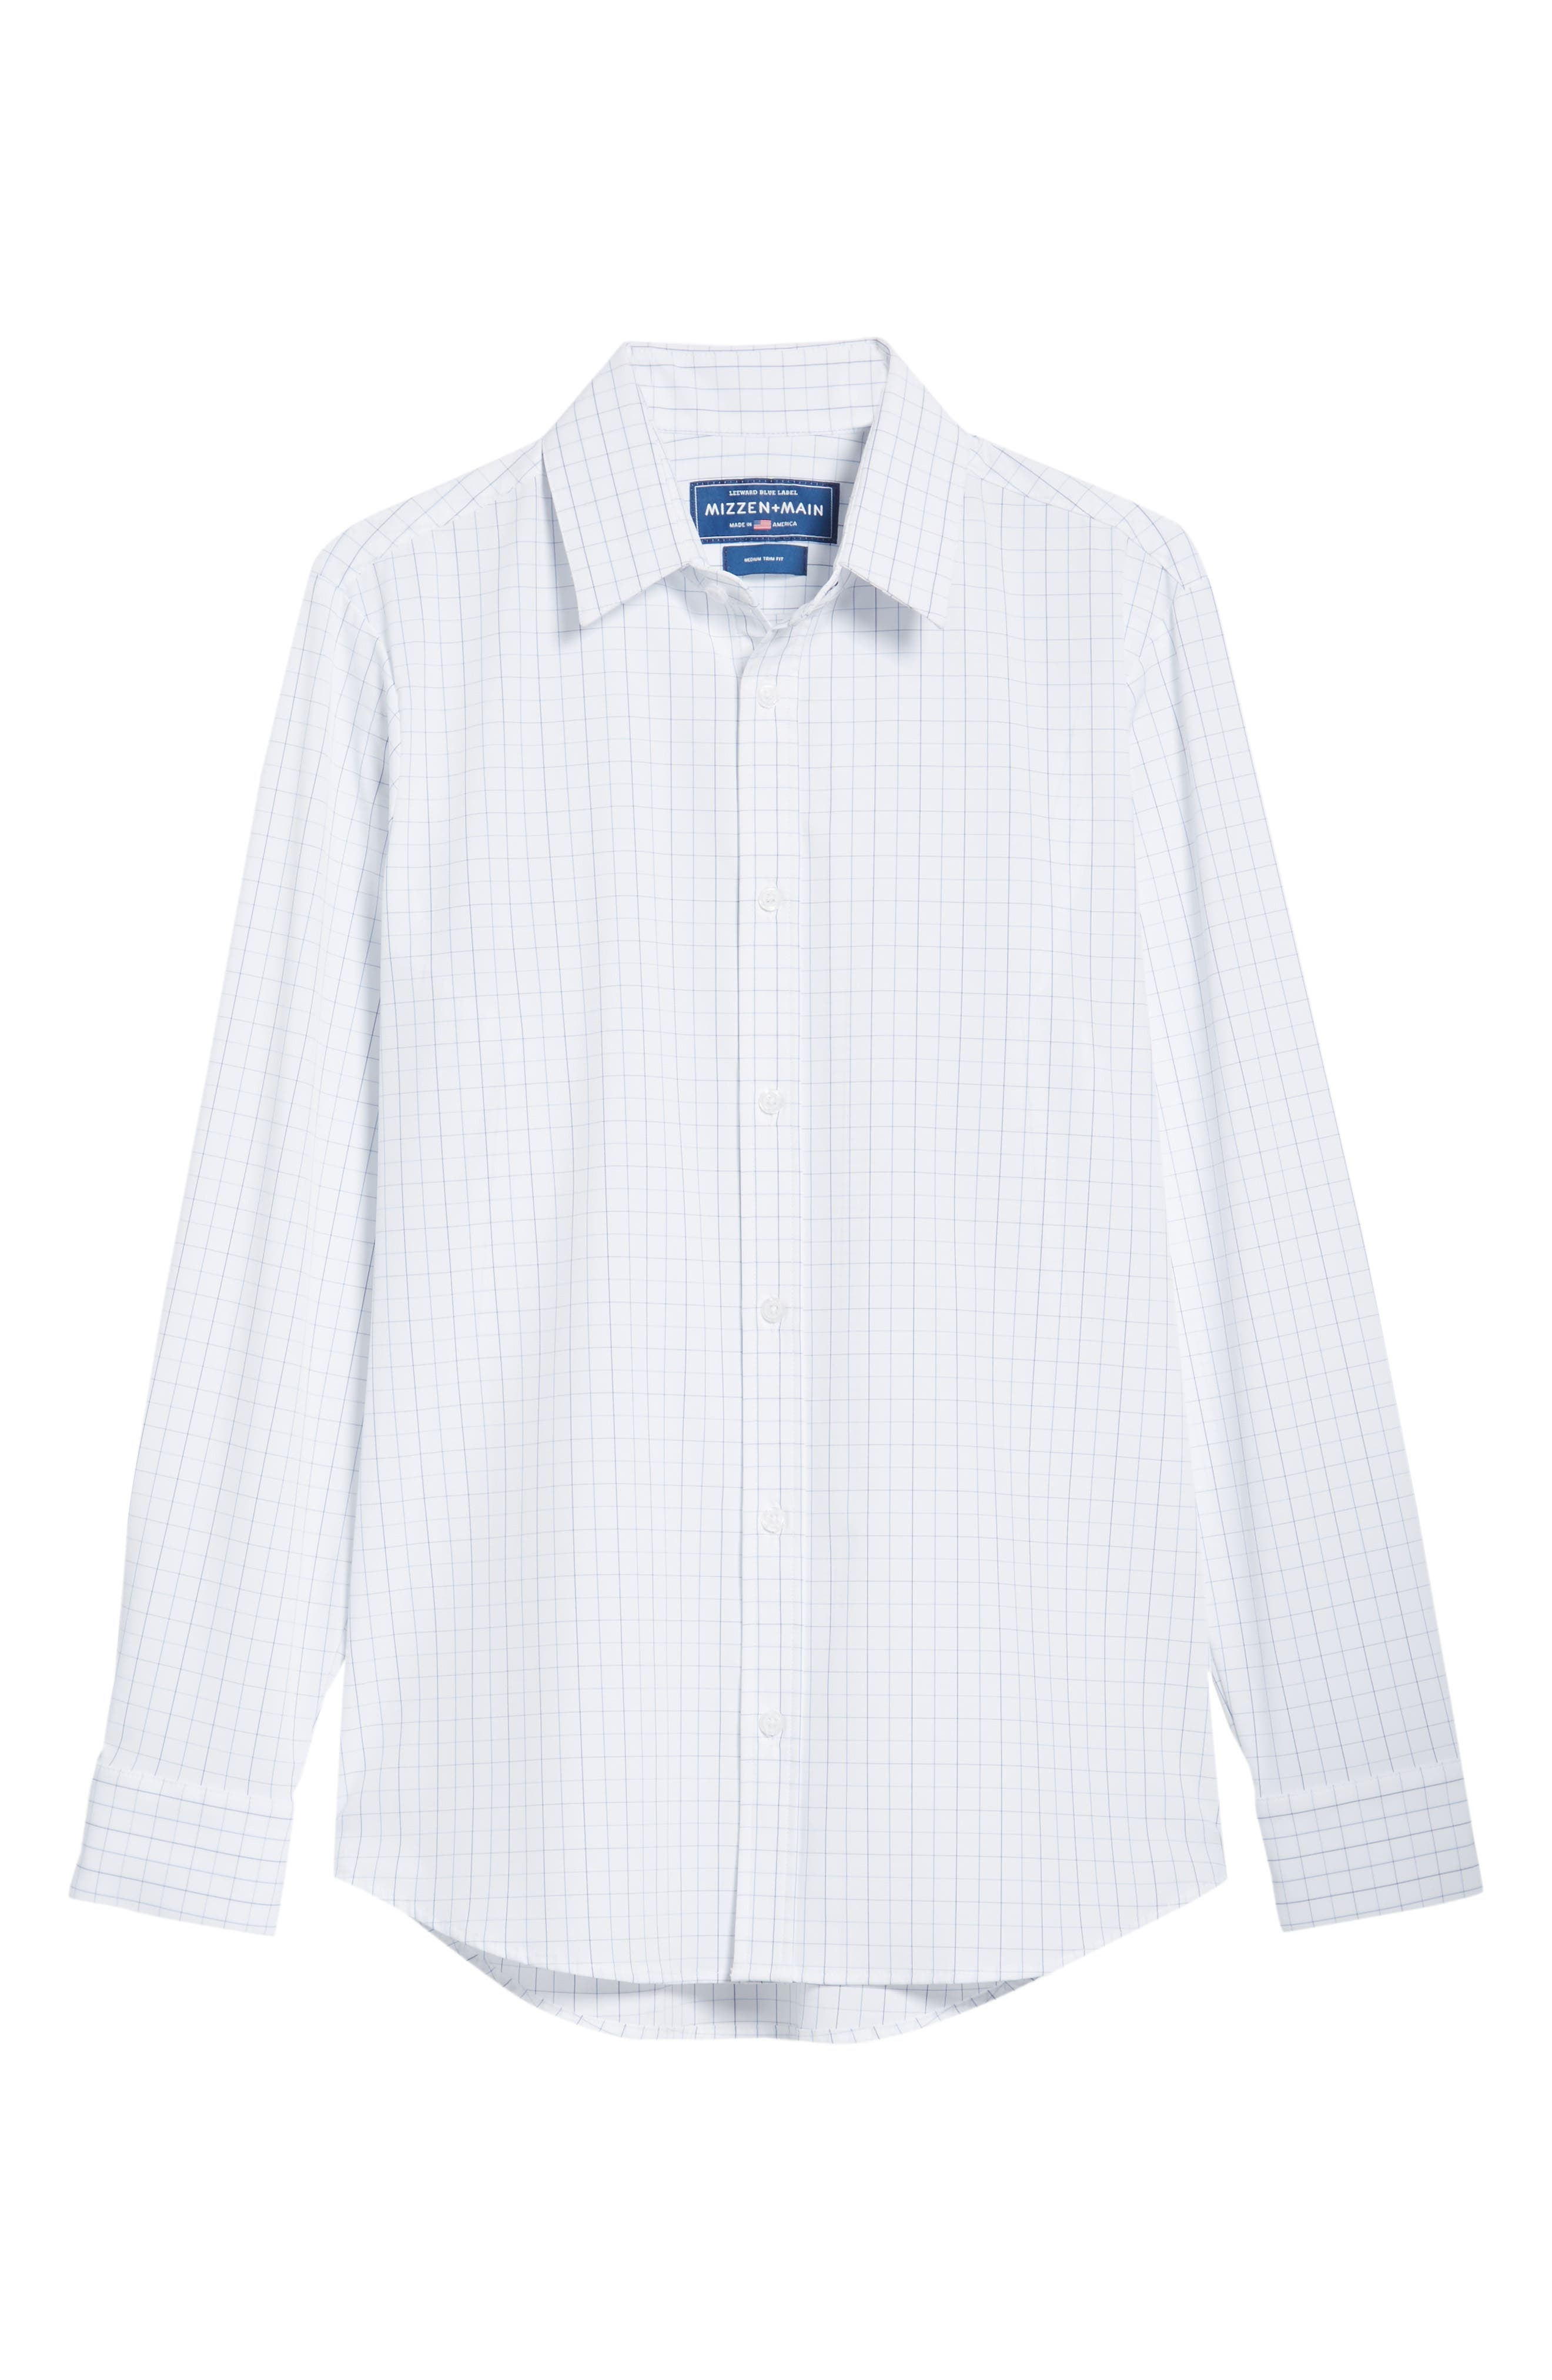 Buckner Slim Fit Grid Performance Sport Shirt,                             Alternate thumbnail 6, color,                             400